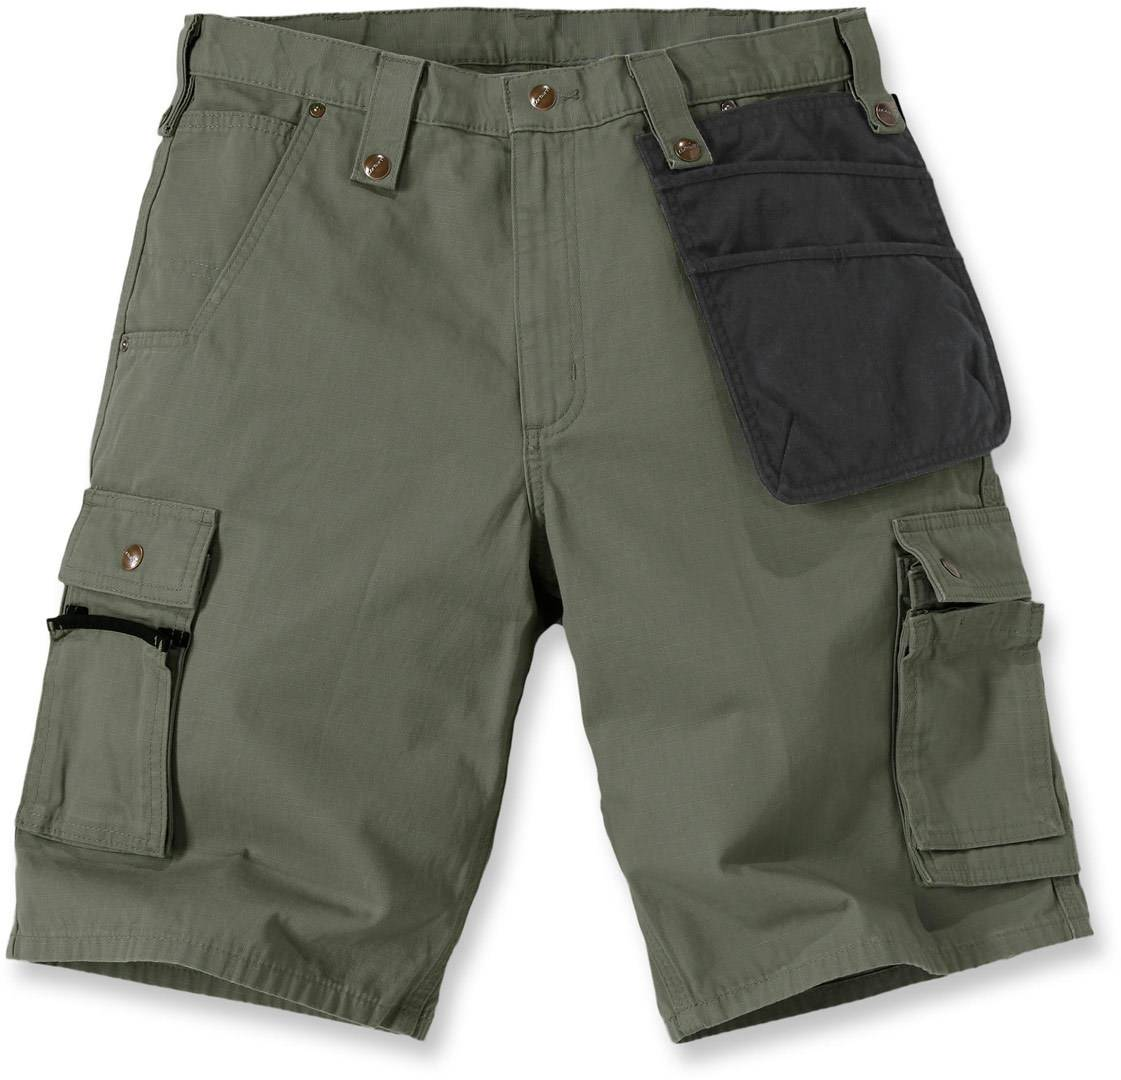 Carhartt Multi Pocket Ripstop Pantalones cortos Verde 36